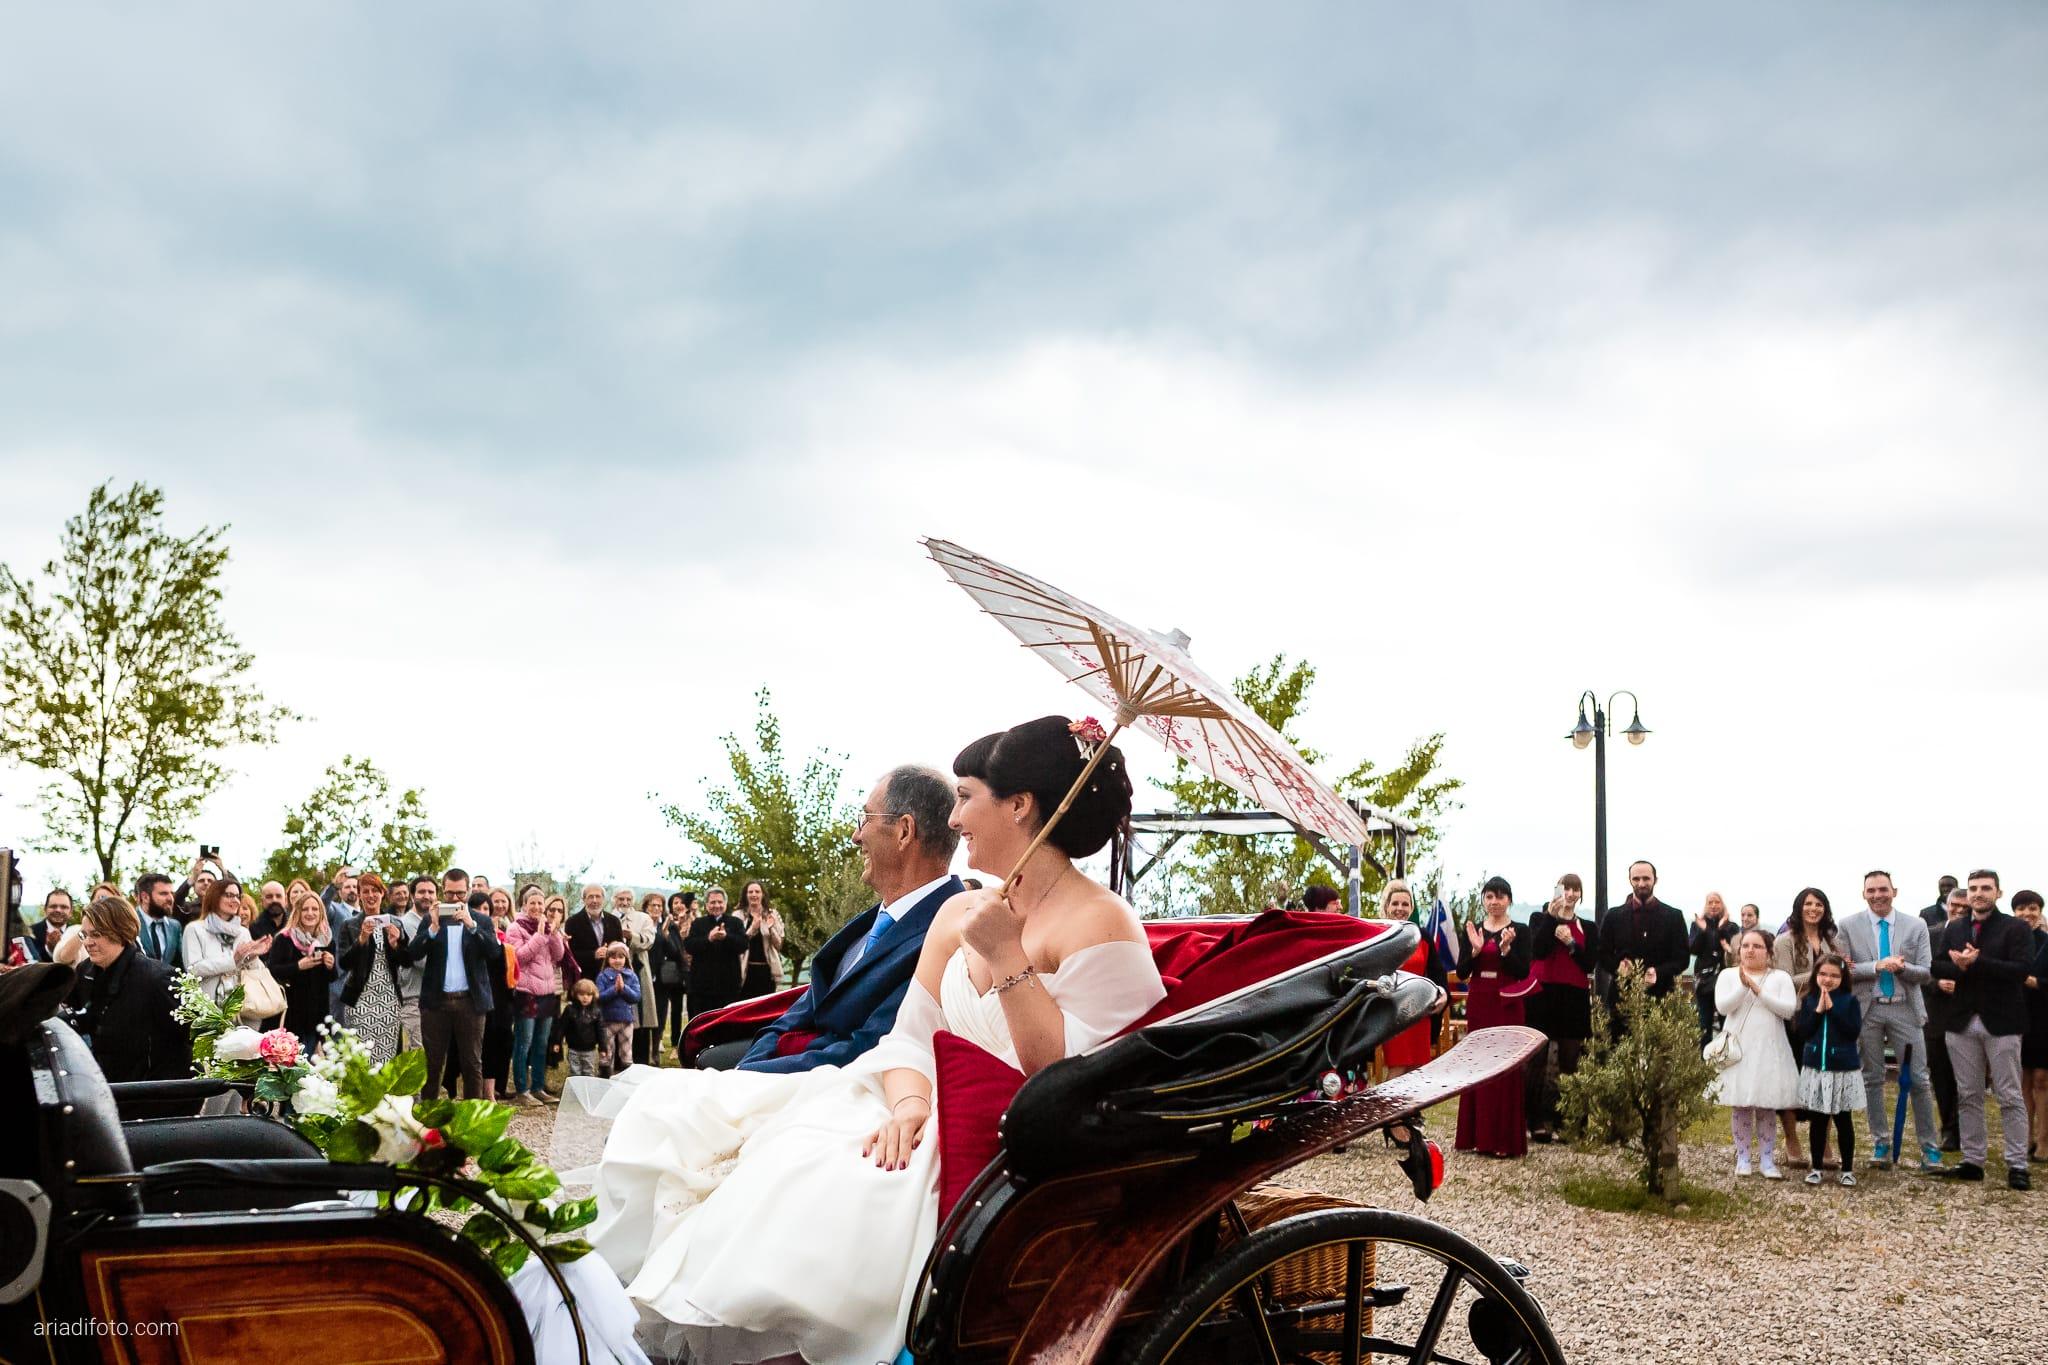 Agnese Alessandro Matrimonio Centro Visite Gradina Doberdo Gorizia Farra cerimonia carrozza ingresso sposa